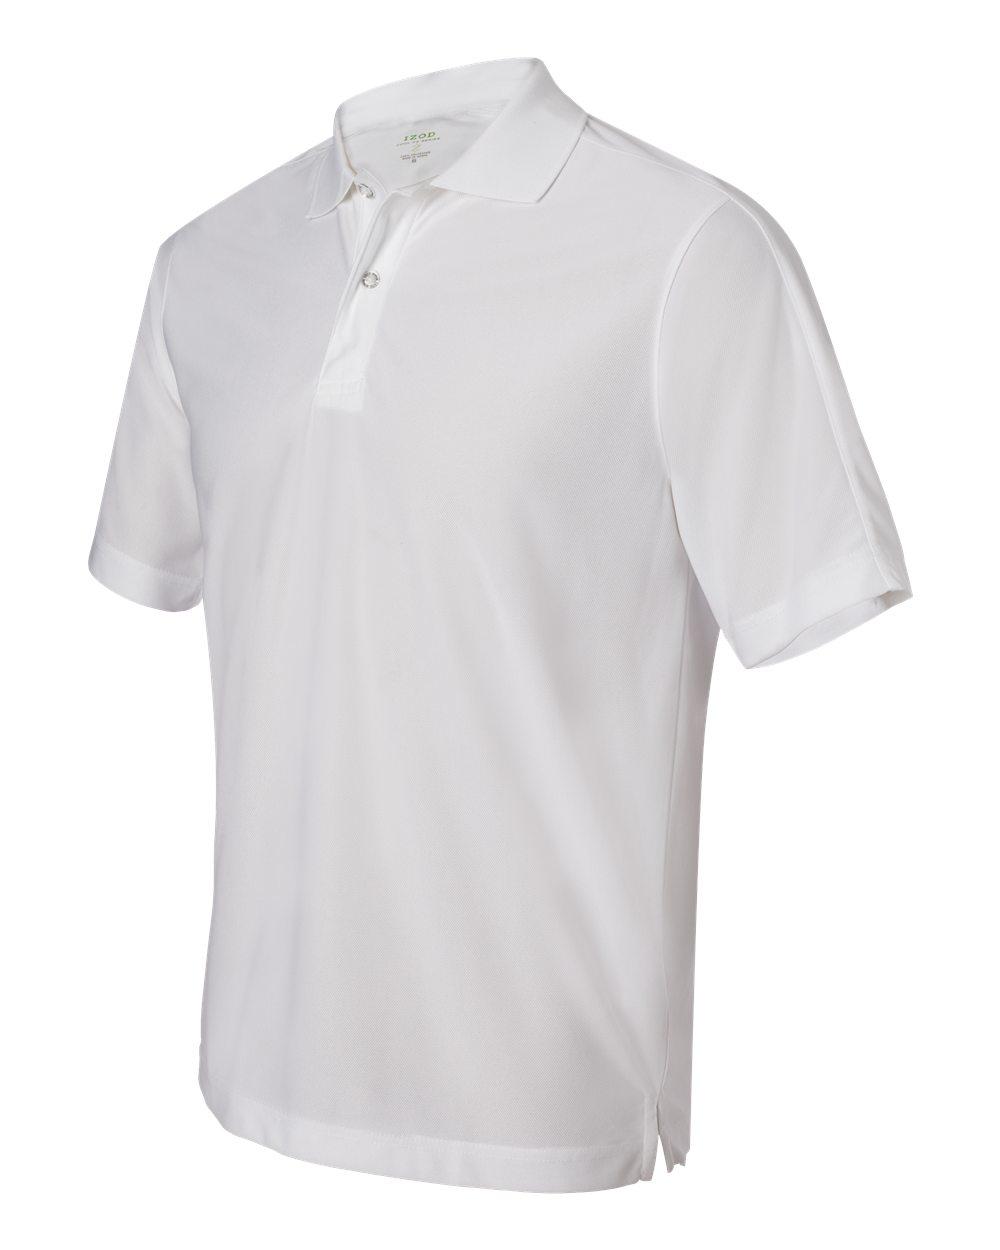 IZOD 13Z0075 - Performance Pique Sport Shirt